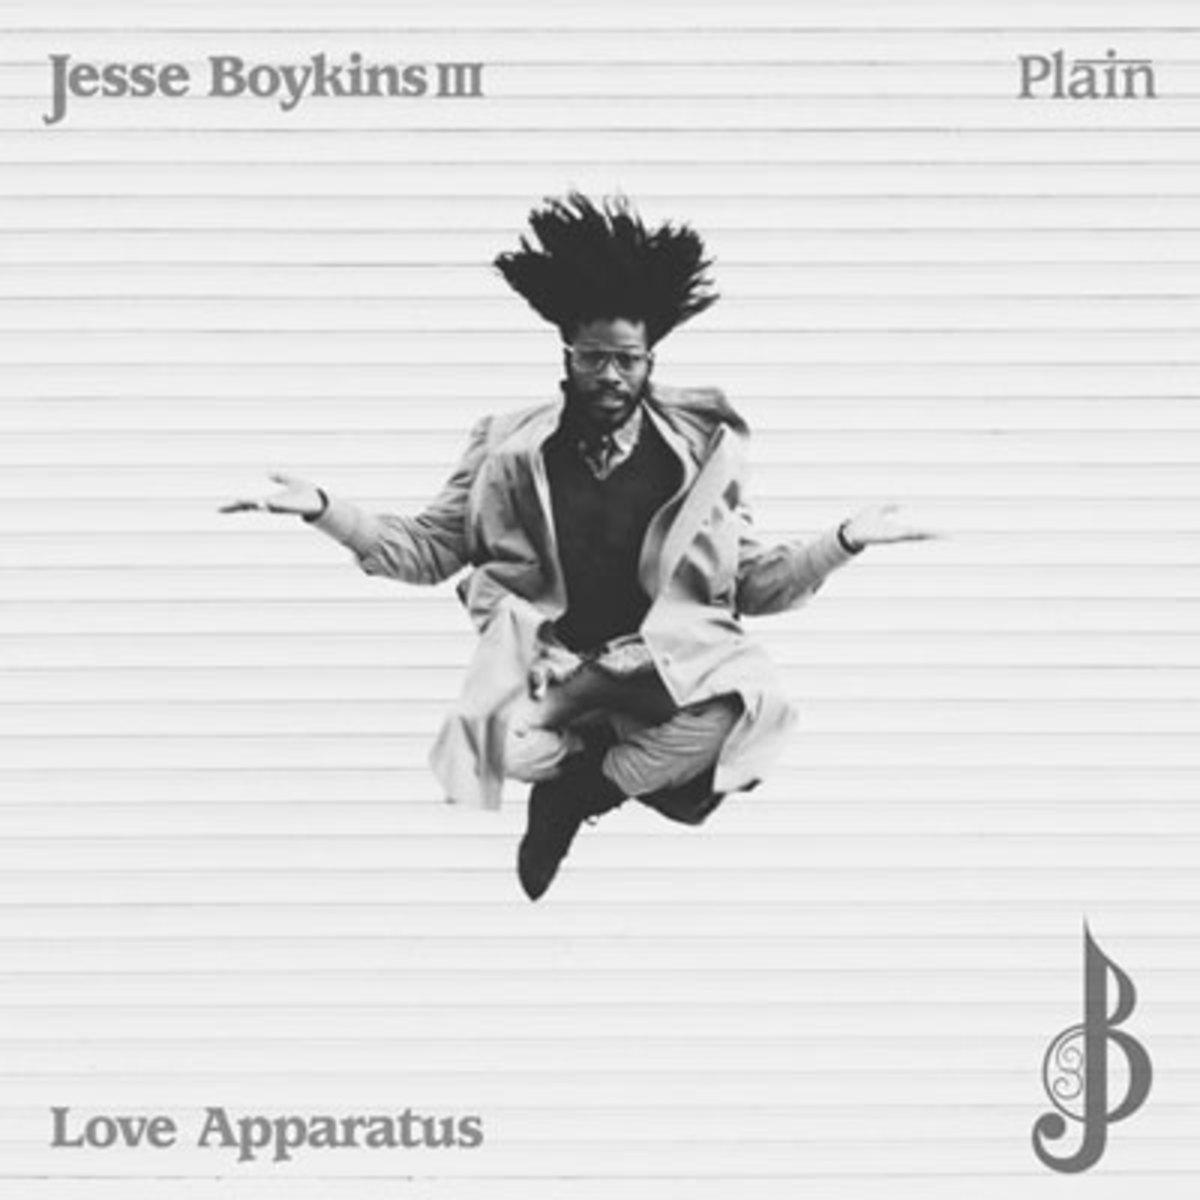 jesseboykins-plain.jpg